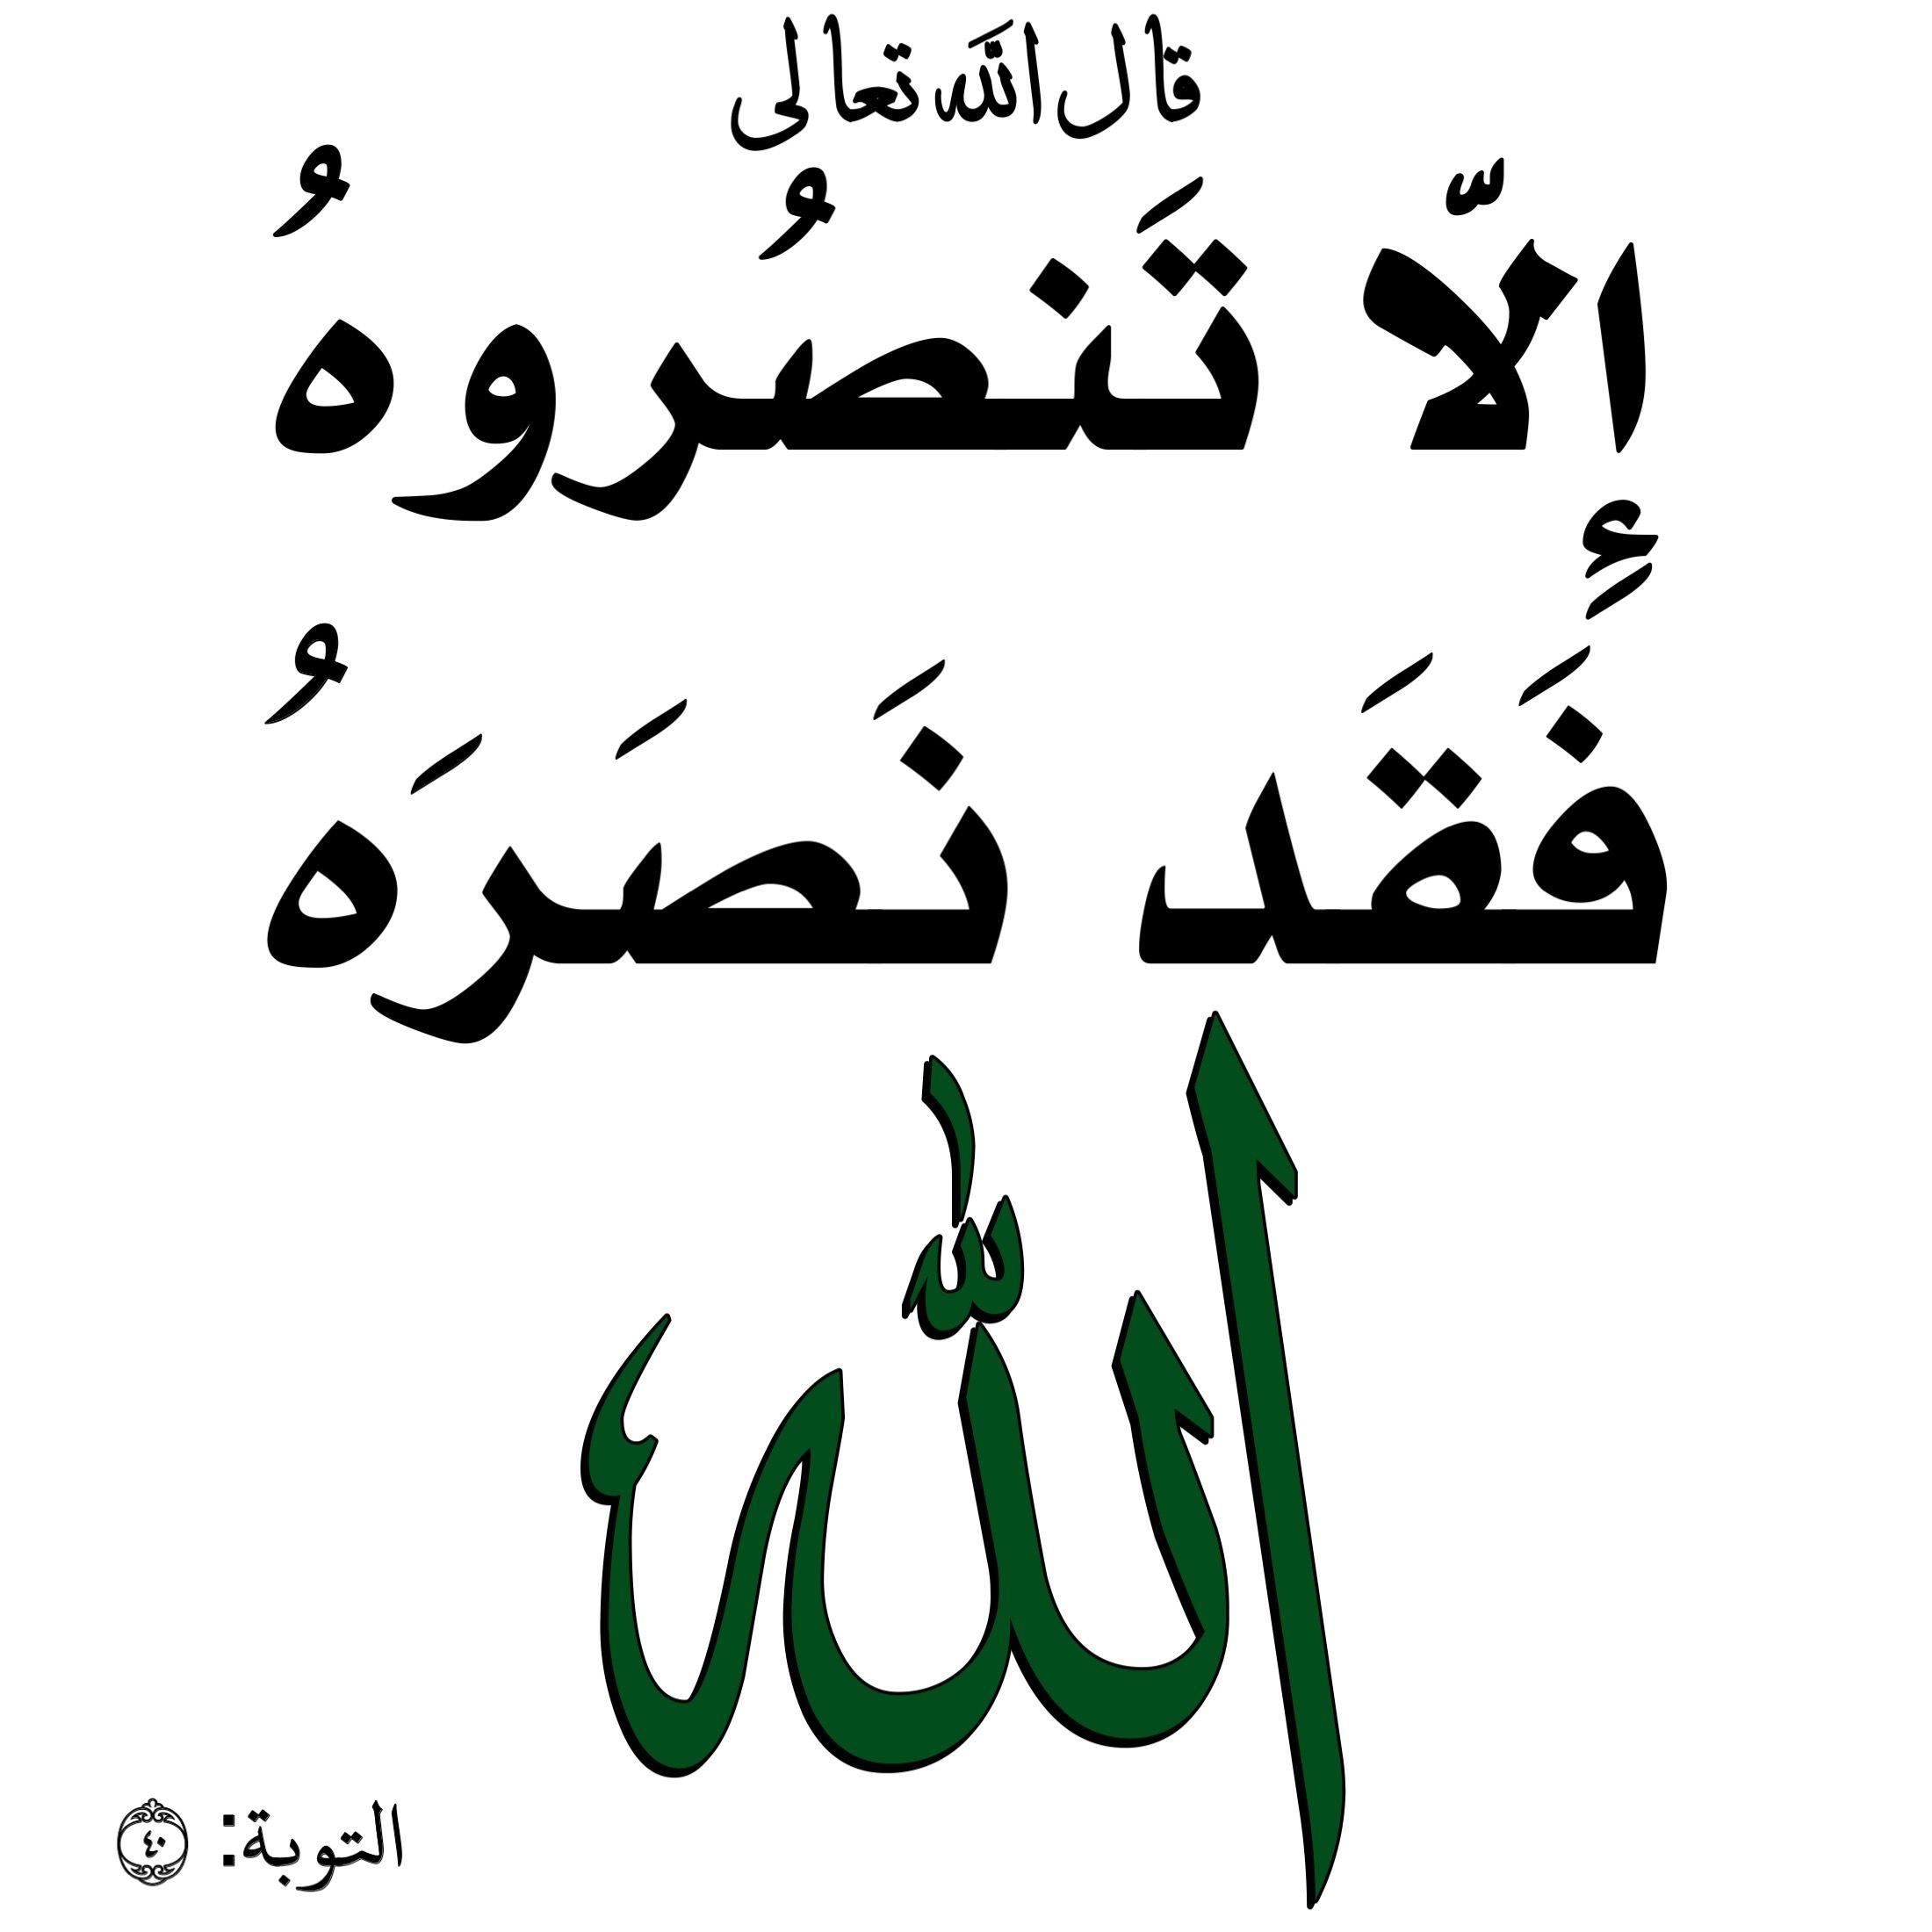 Pin By الفردوس On آيات من القرآن الكريم Beautiful Morning Messages Islam Facts Quran Verses